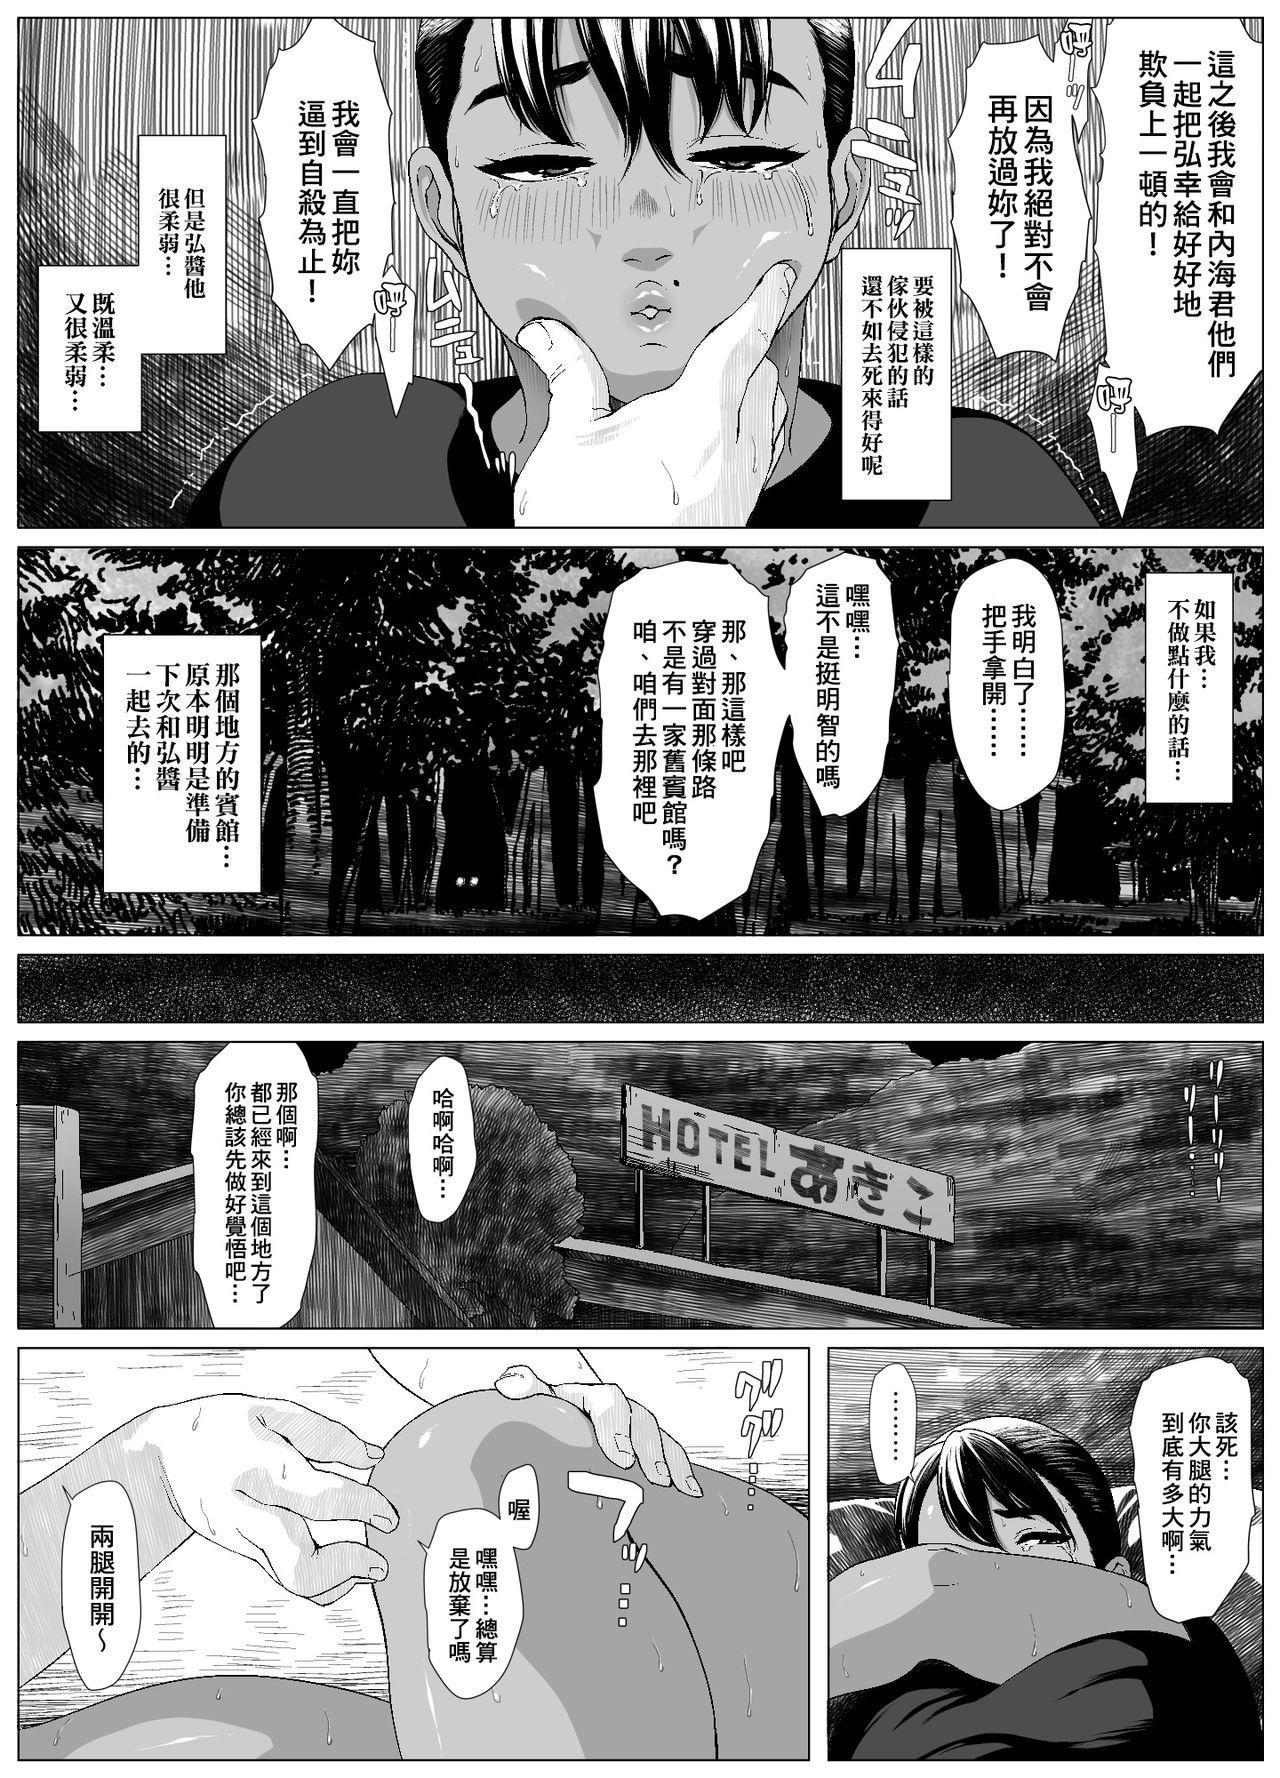 Koufukuron - Murase Ayumi Hen 1 13